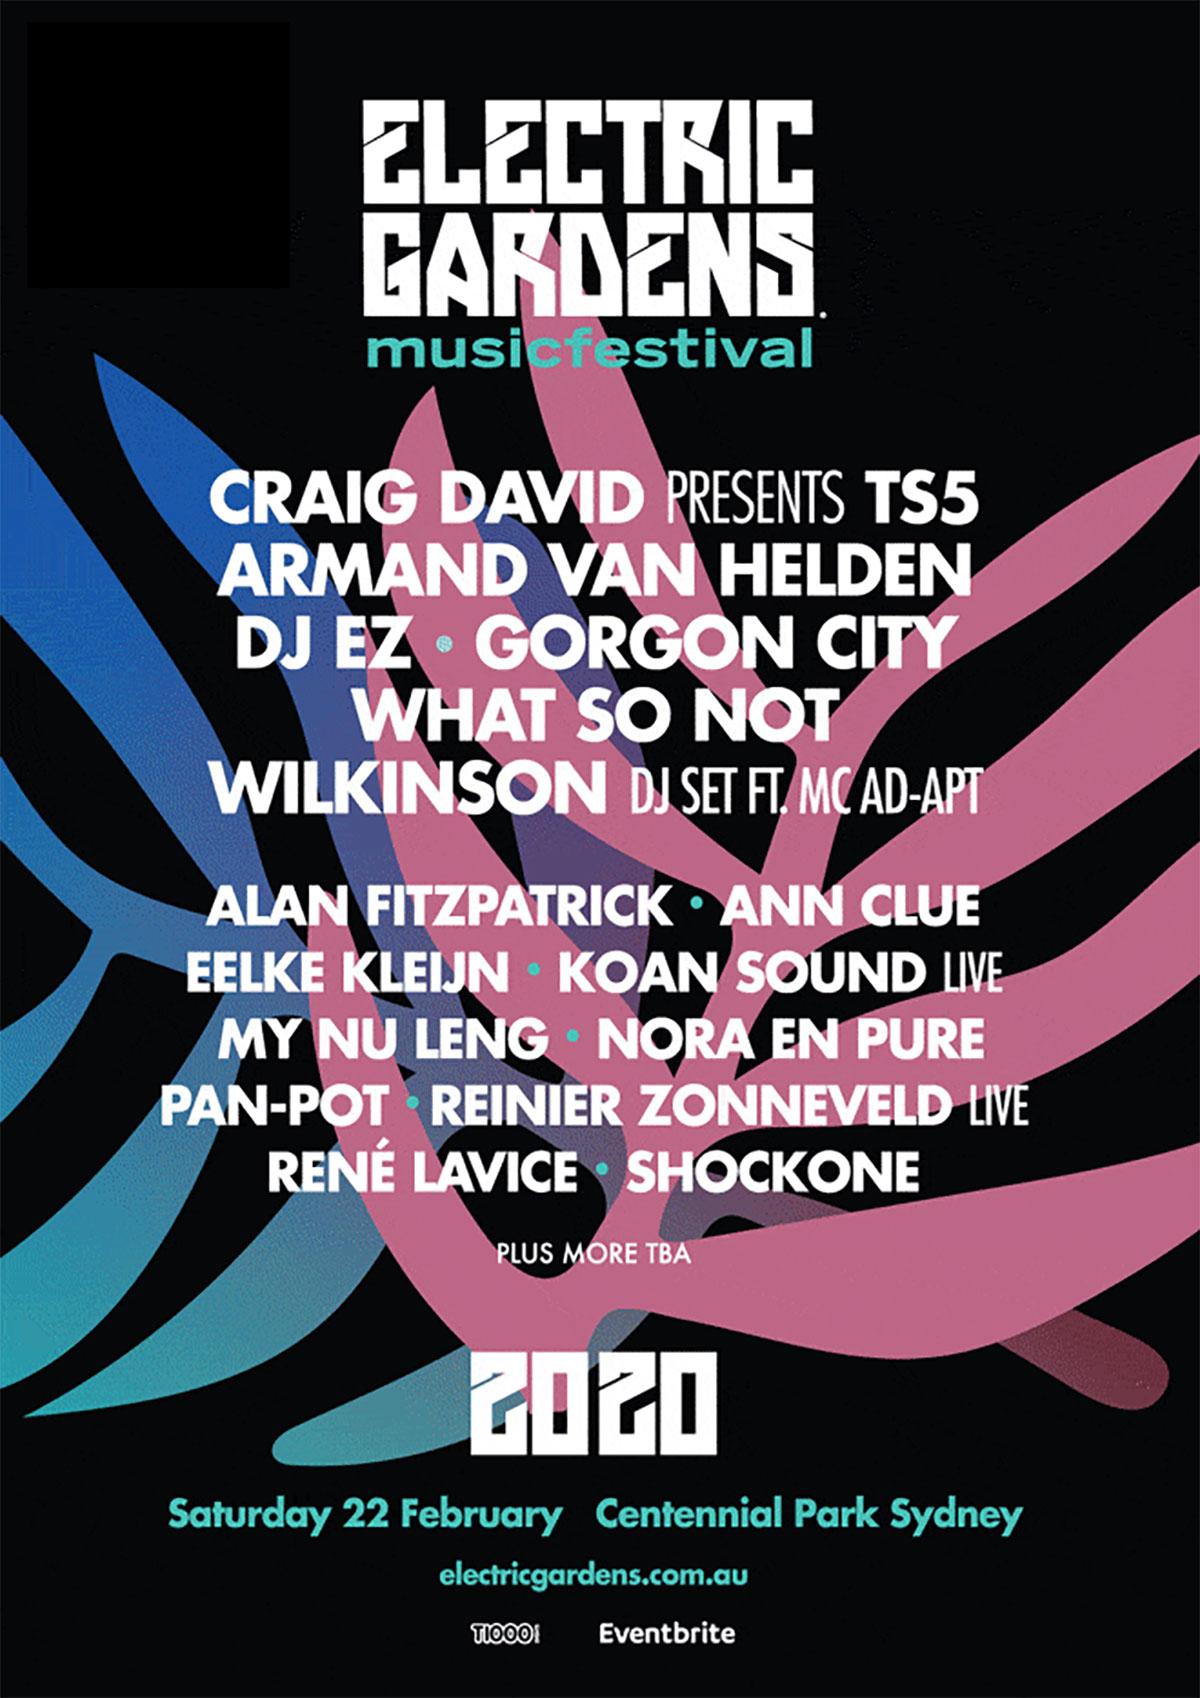 electric-gardens-2020-lineup-poster-02-oz-edm